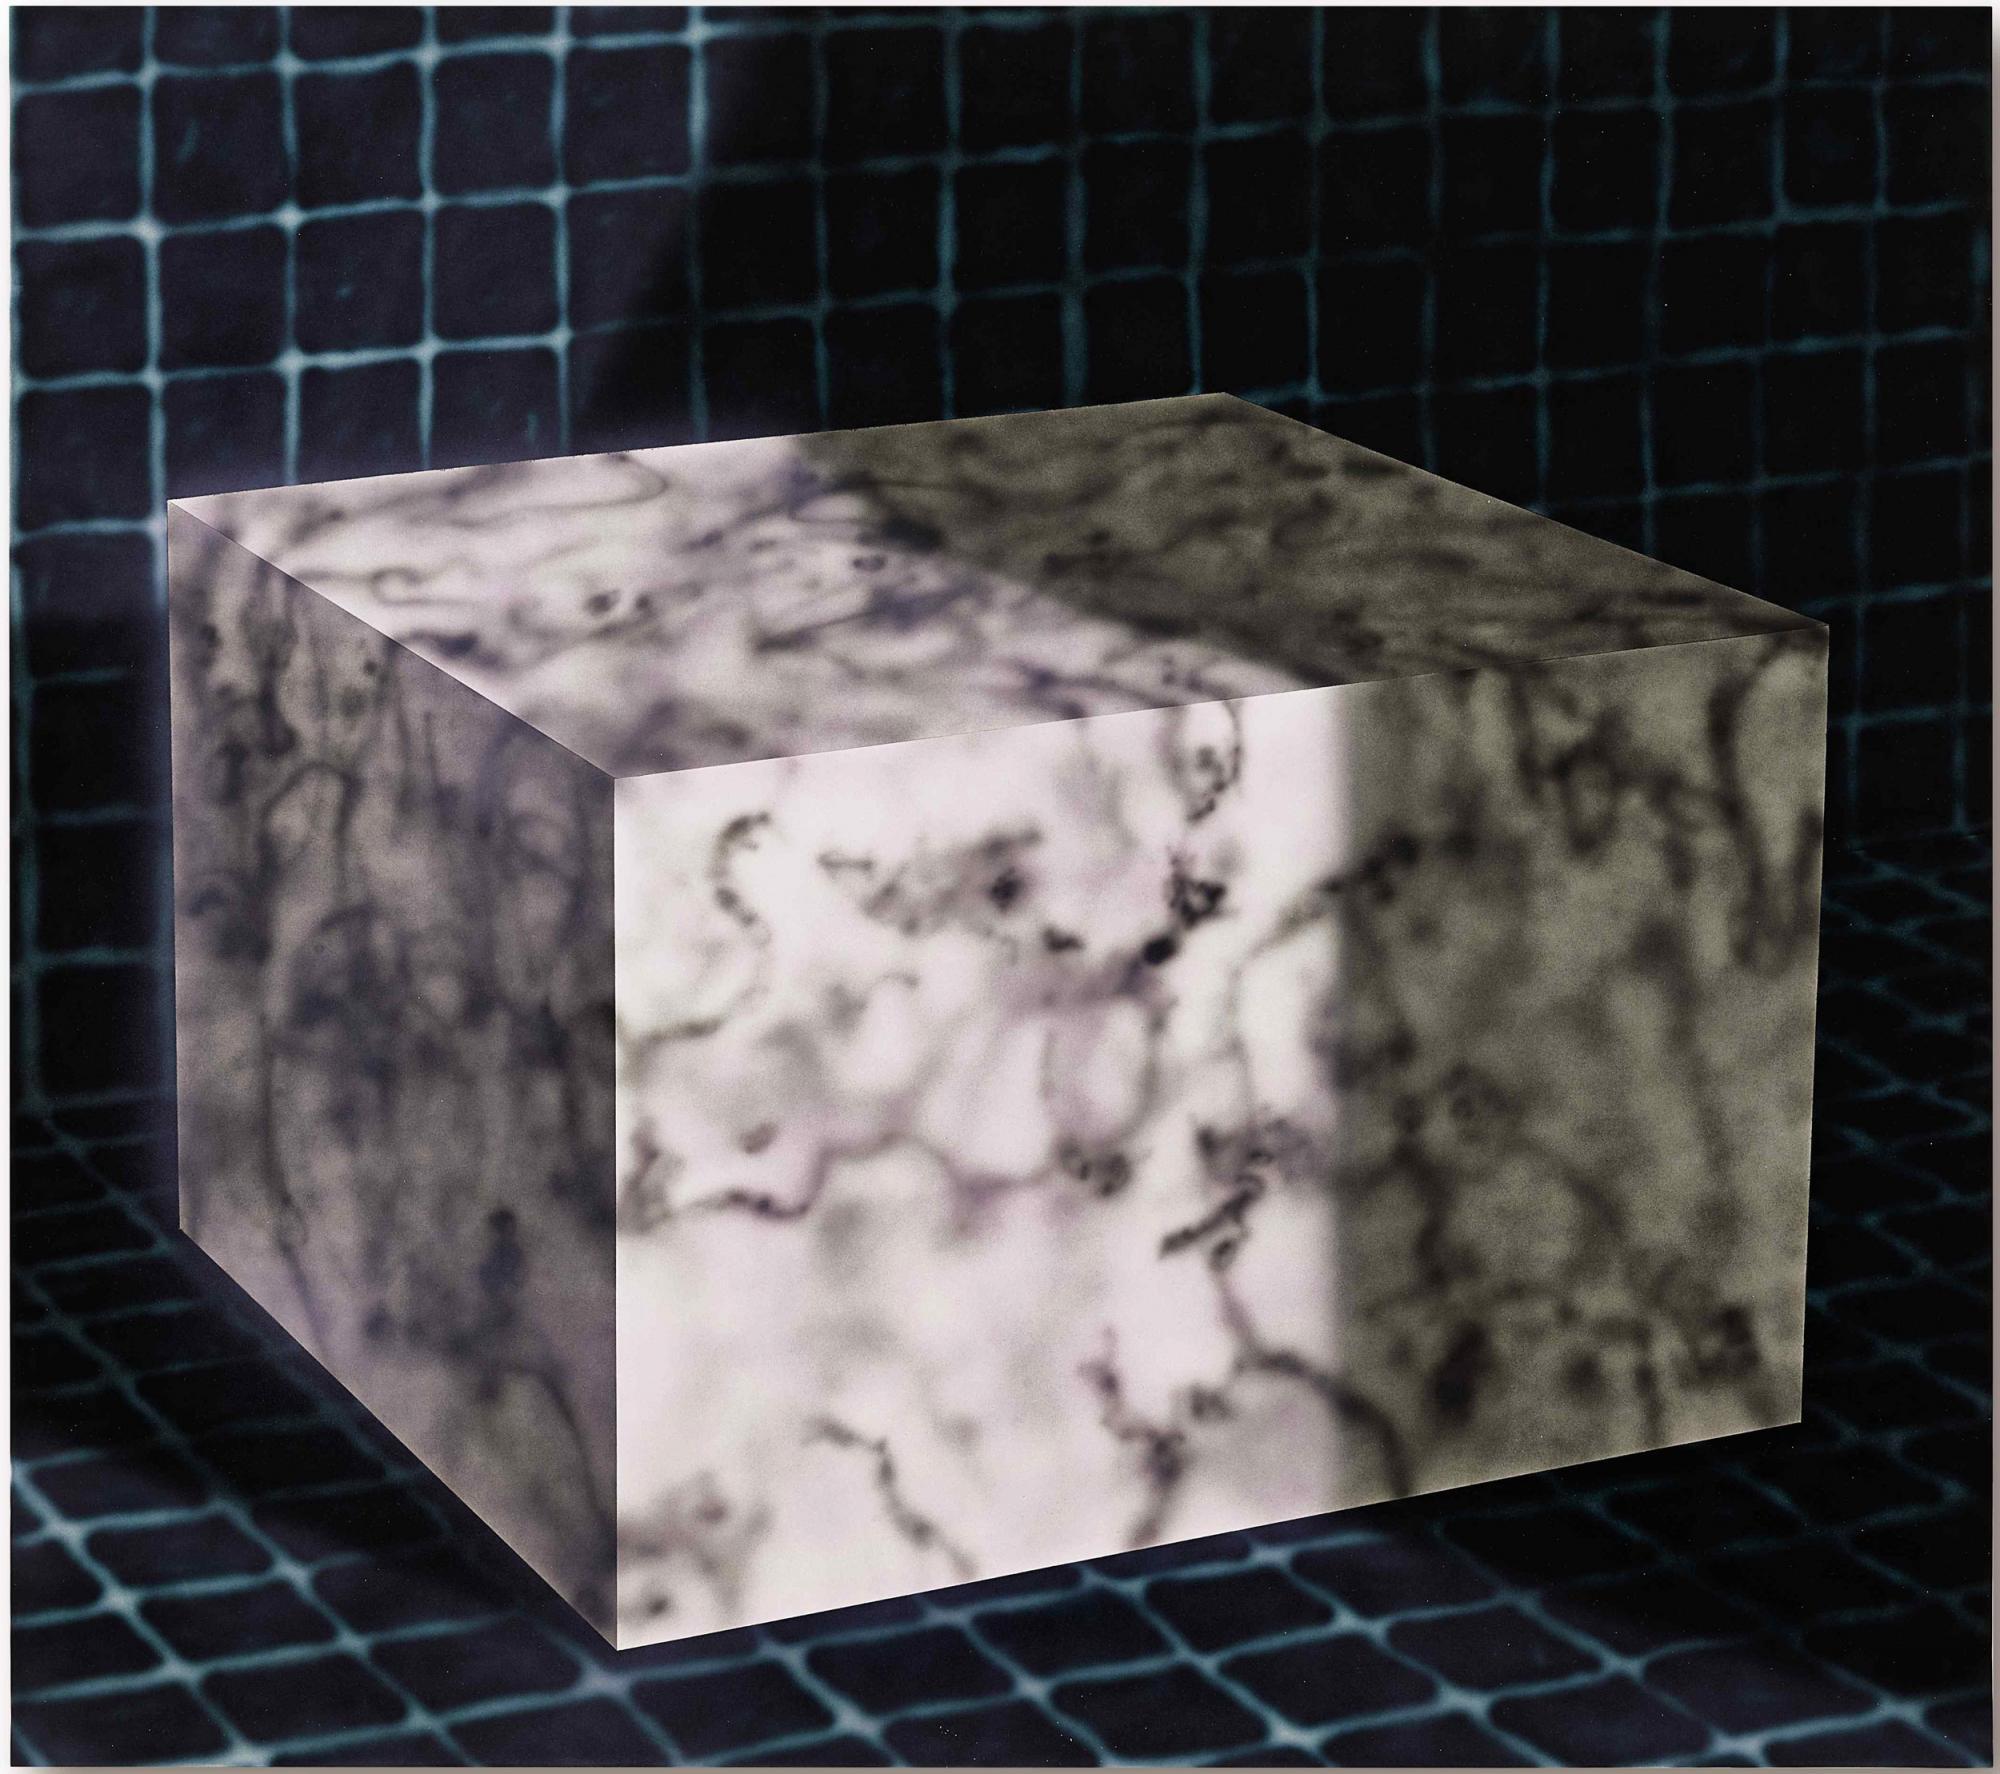 Avery-Singer---Untitled-(Cube).jpg